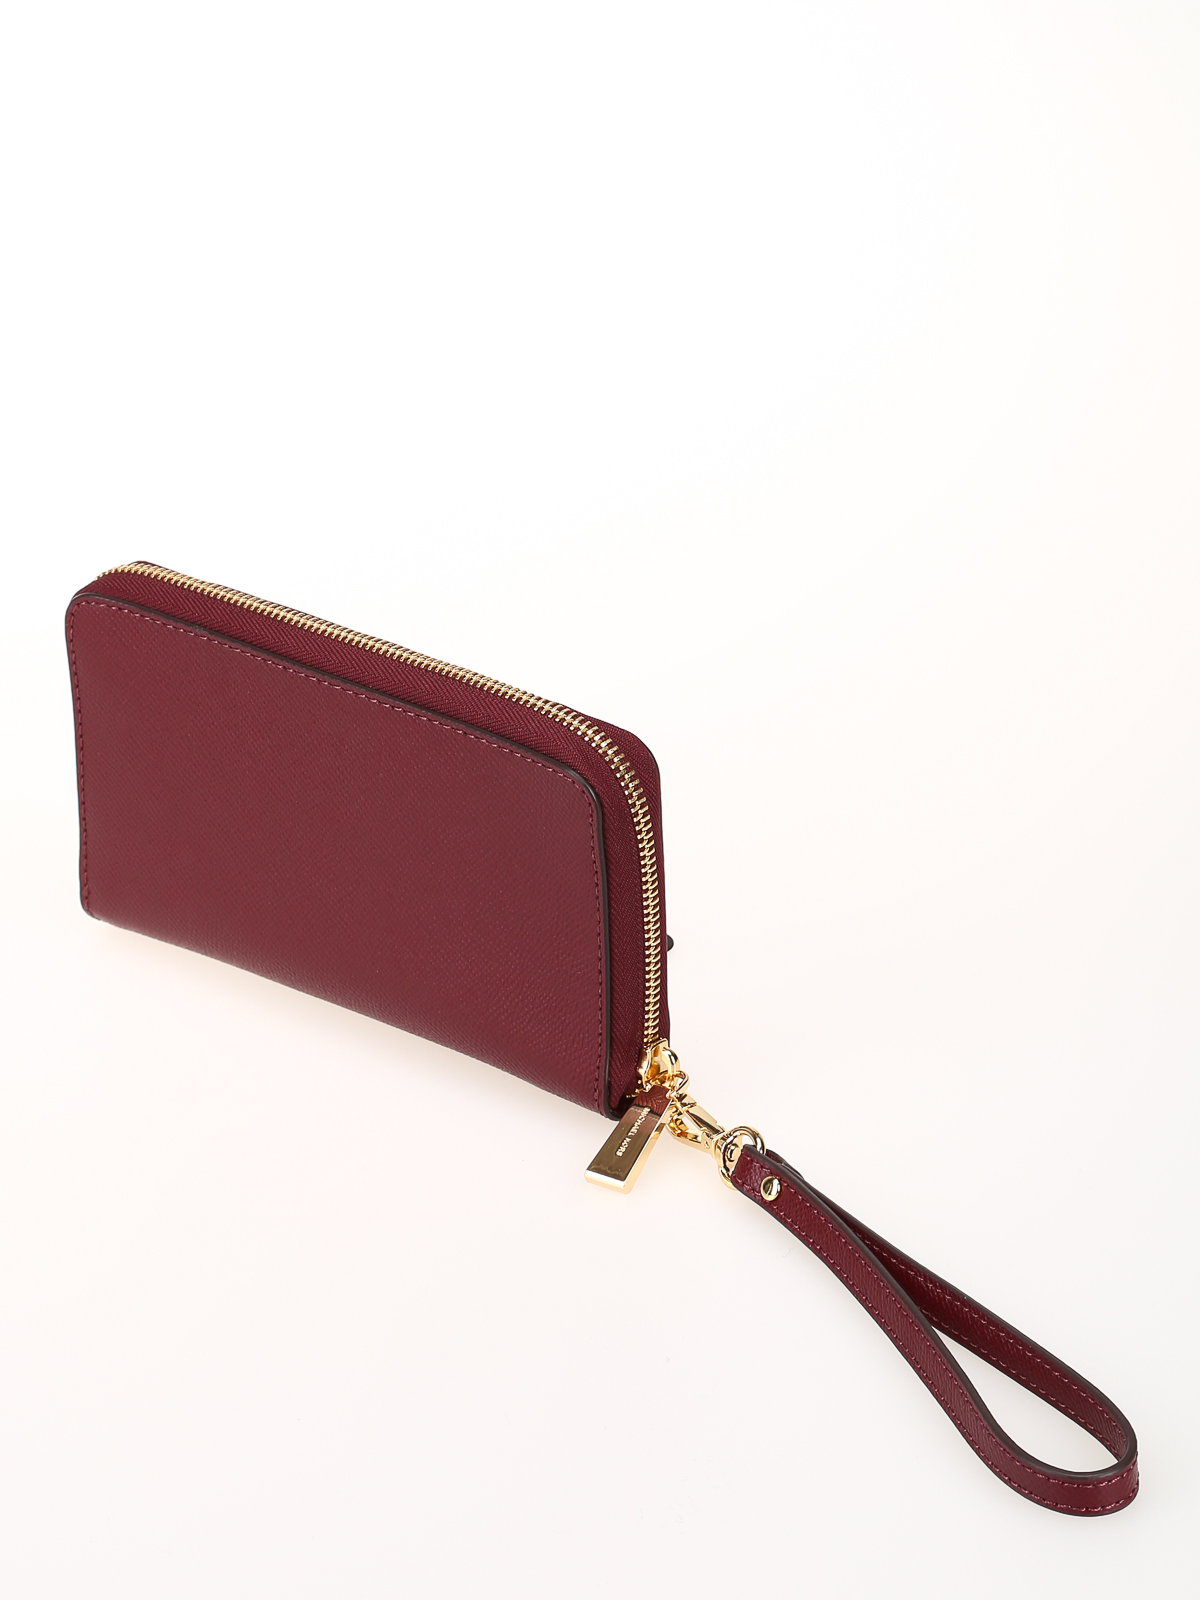 4714c6756fd iKRIX MICHAEL KORS: wallets & purses - Oxblood large smartphone wristlet